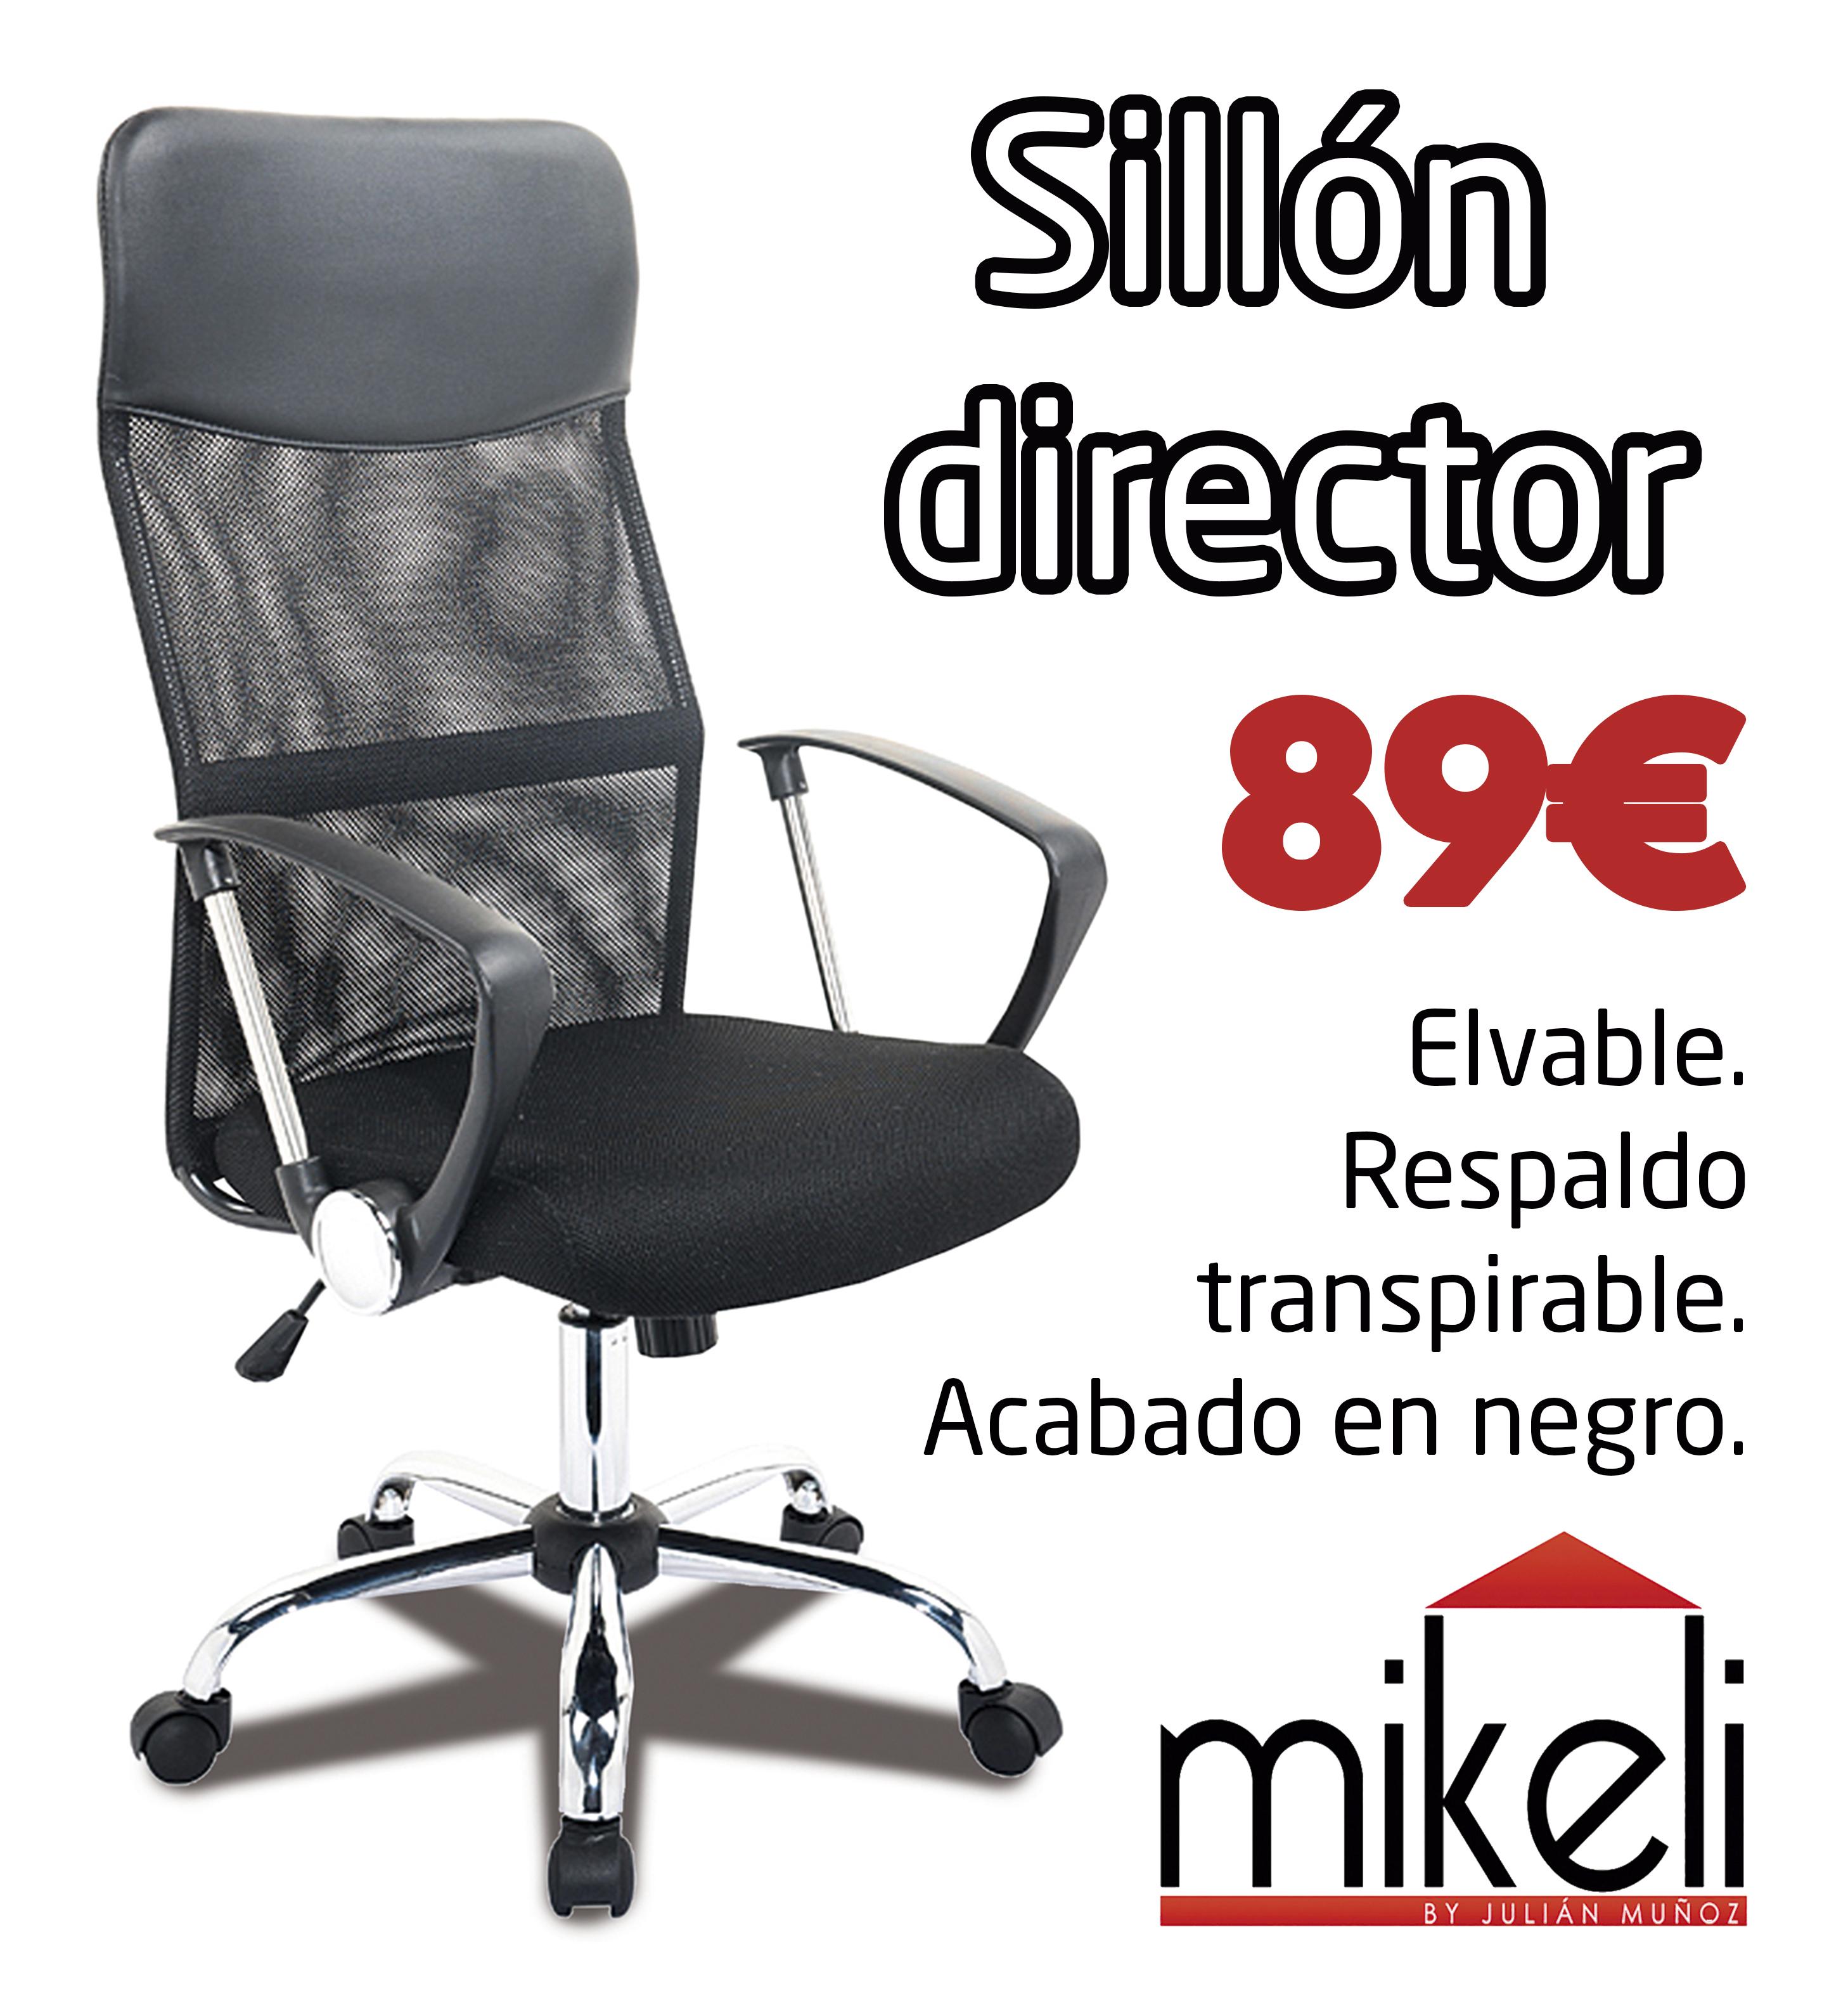 Sillon Director Transpirable Mikeli Tu Tienda De Muebles A  # Muebles Didecor